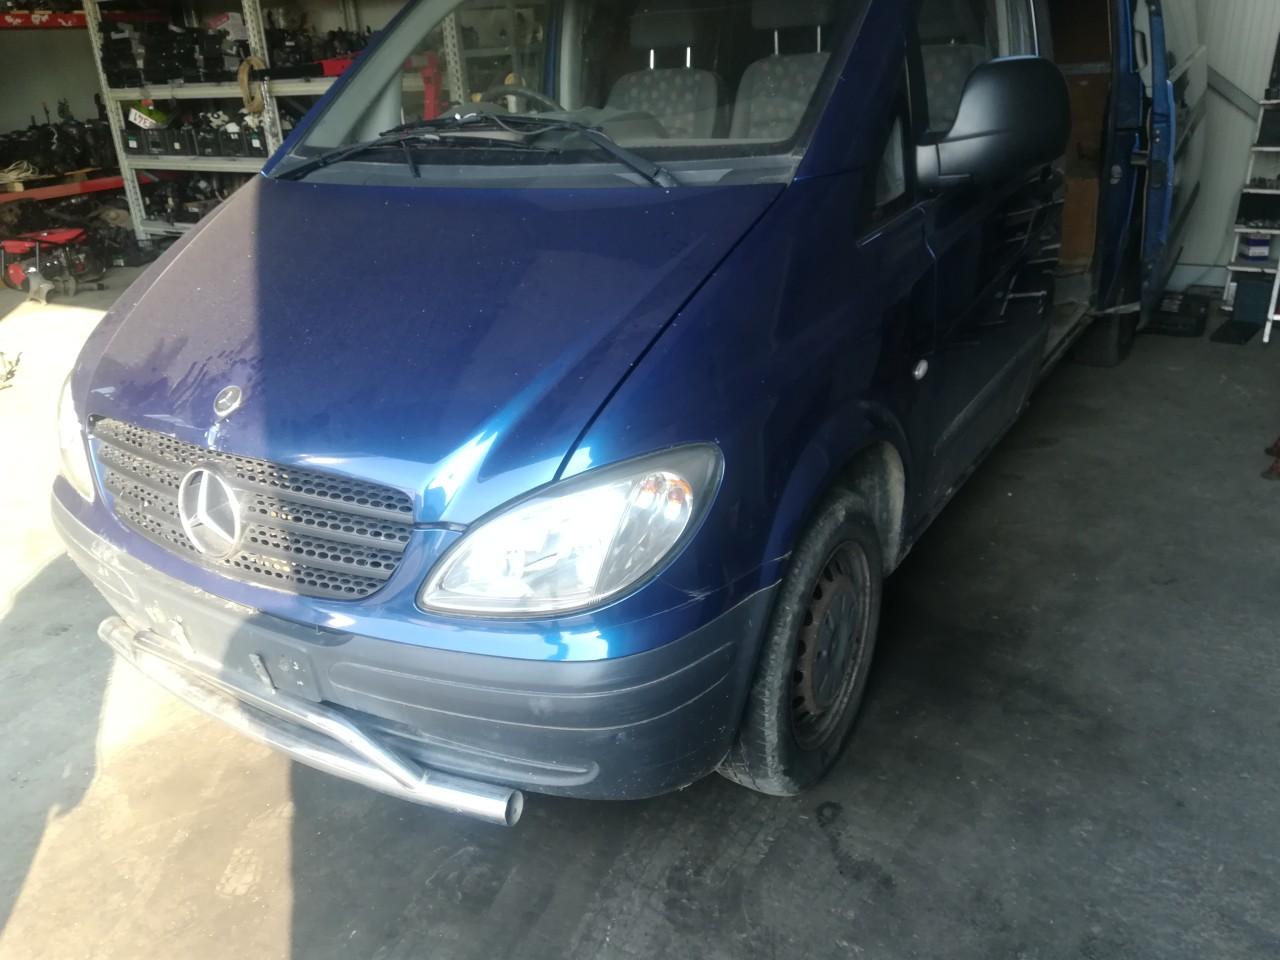 Dezmembrez Mercedes Vito w639 109 motor 646 din 2006 2007 2008 2009